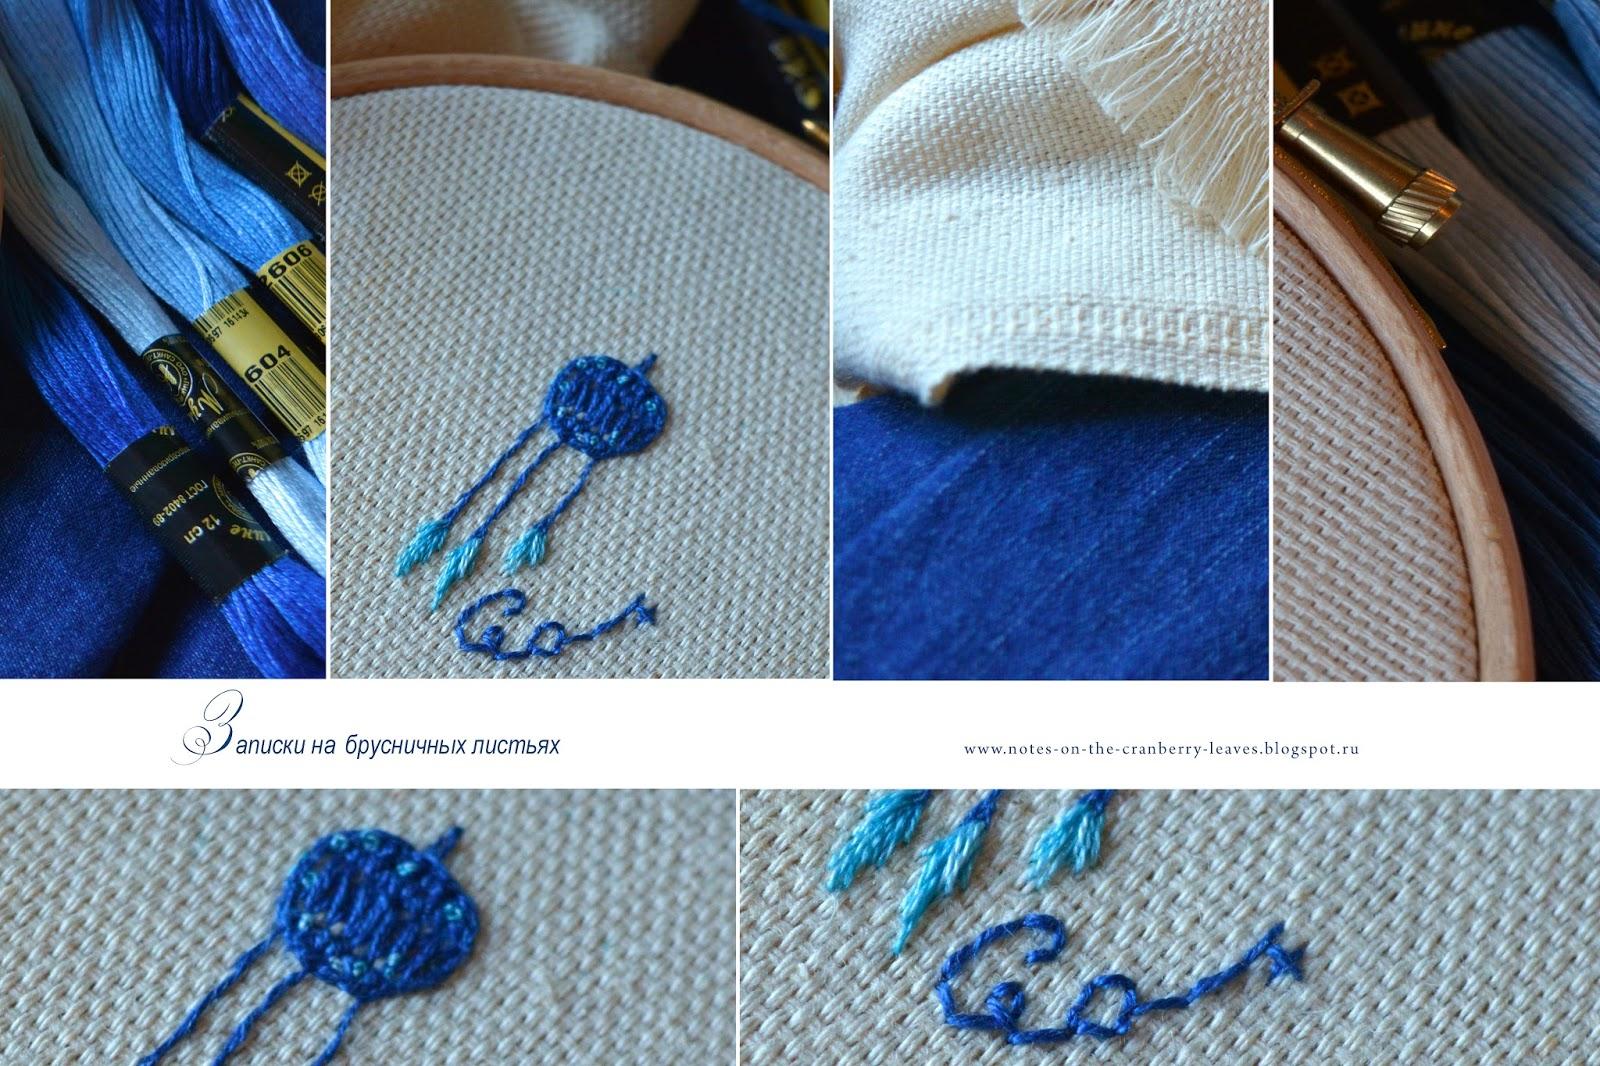 Записка на тему вышивка